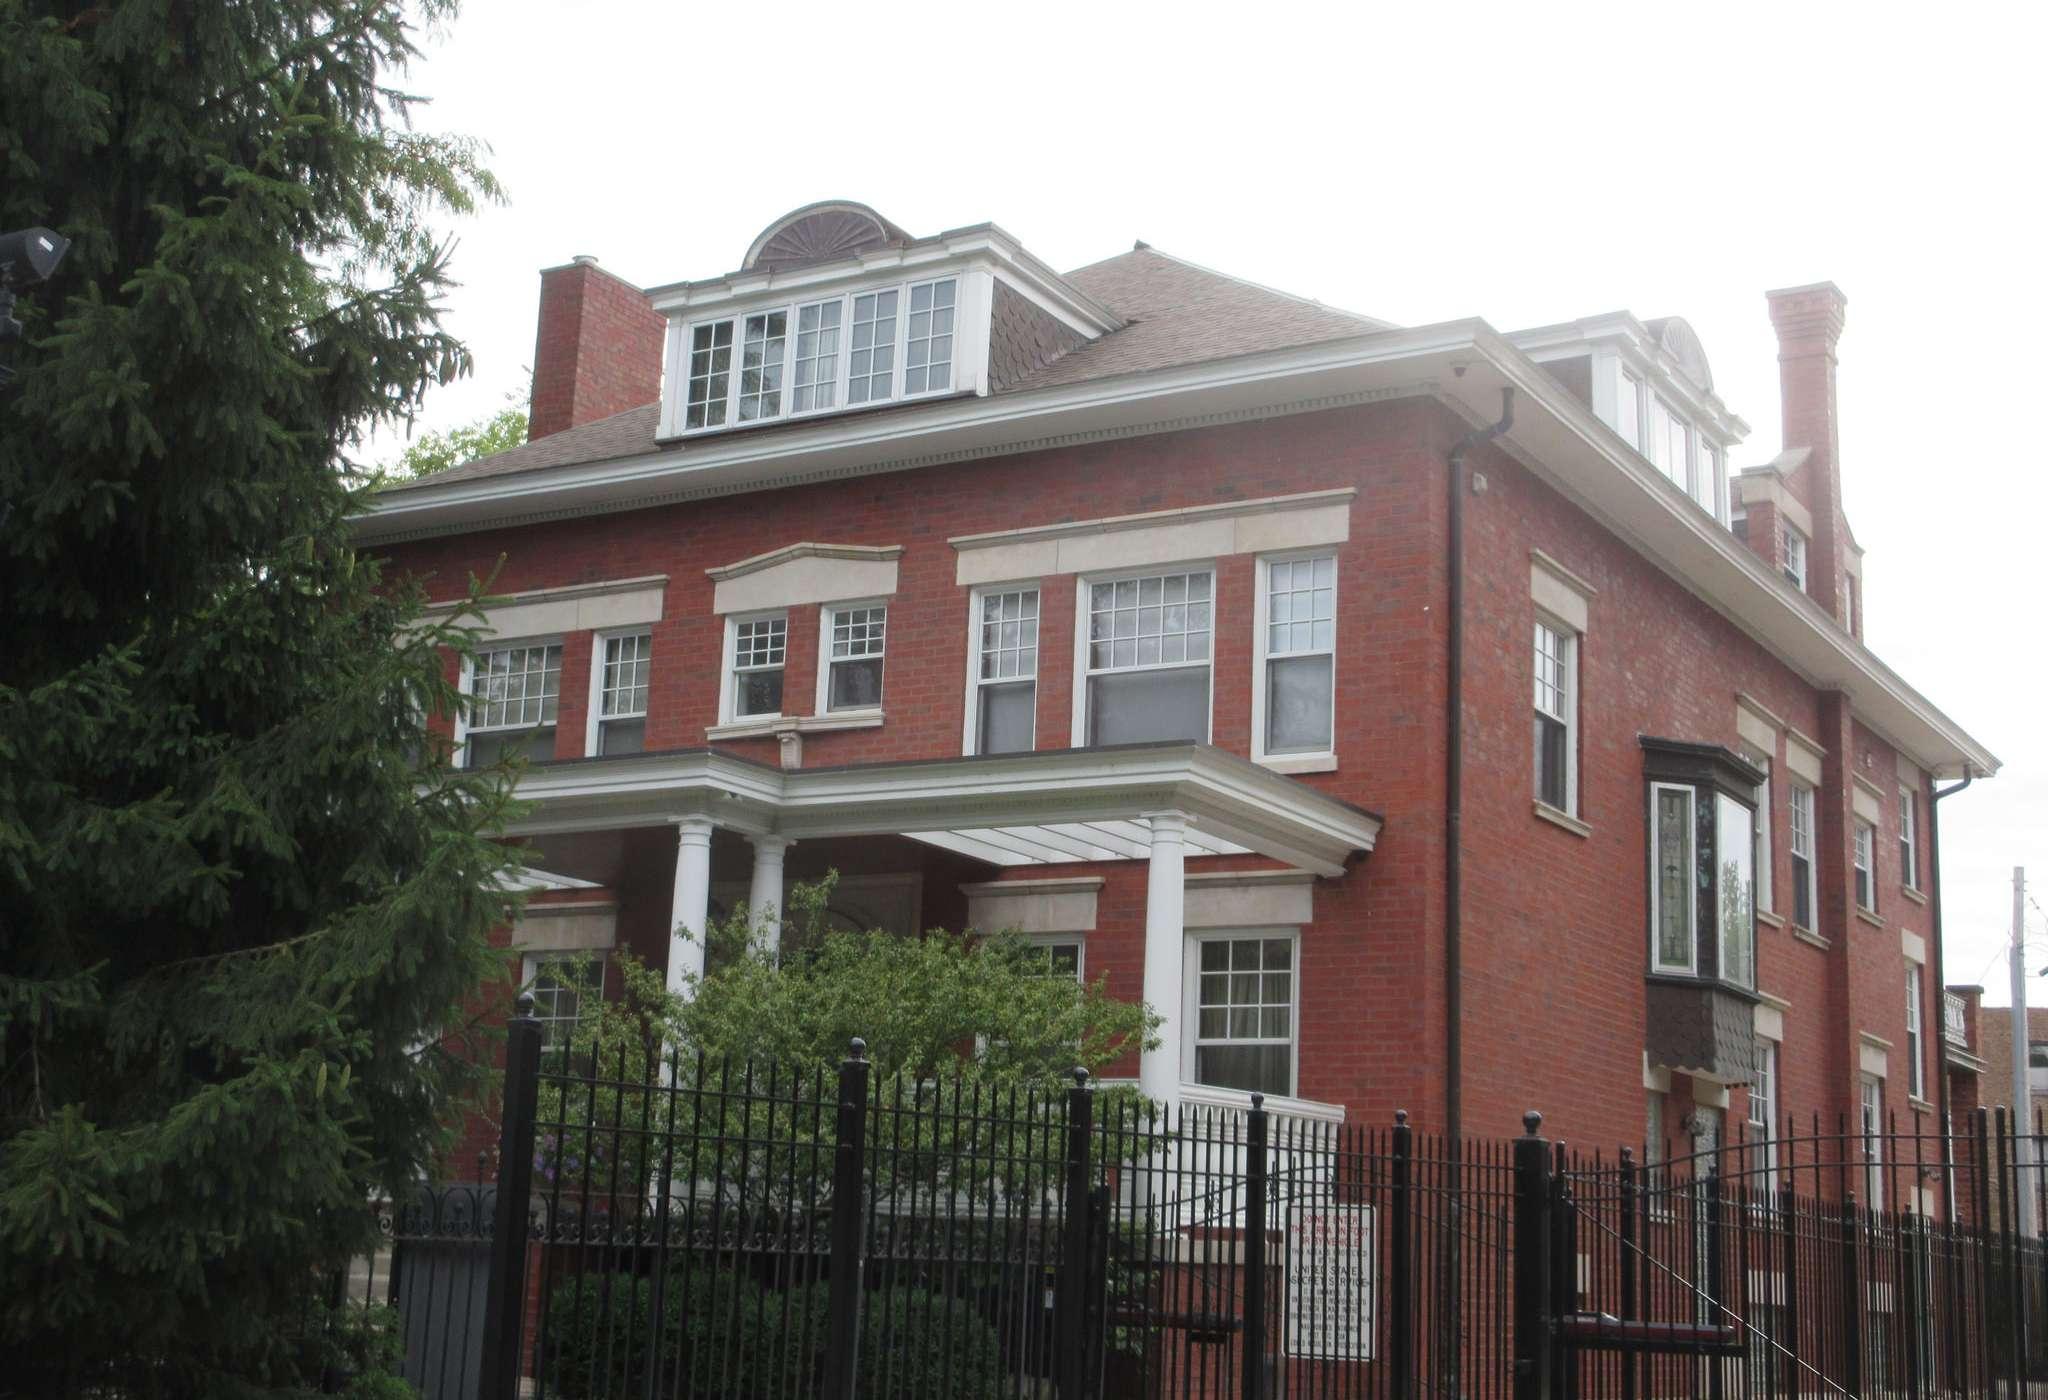 Exterior of the Obama family home